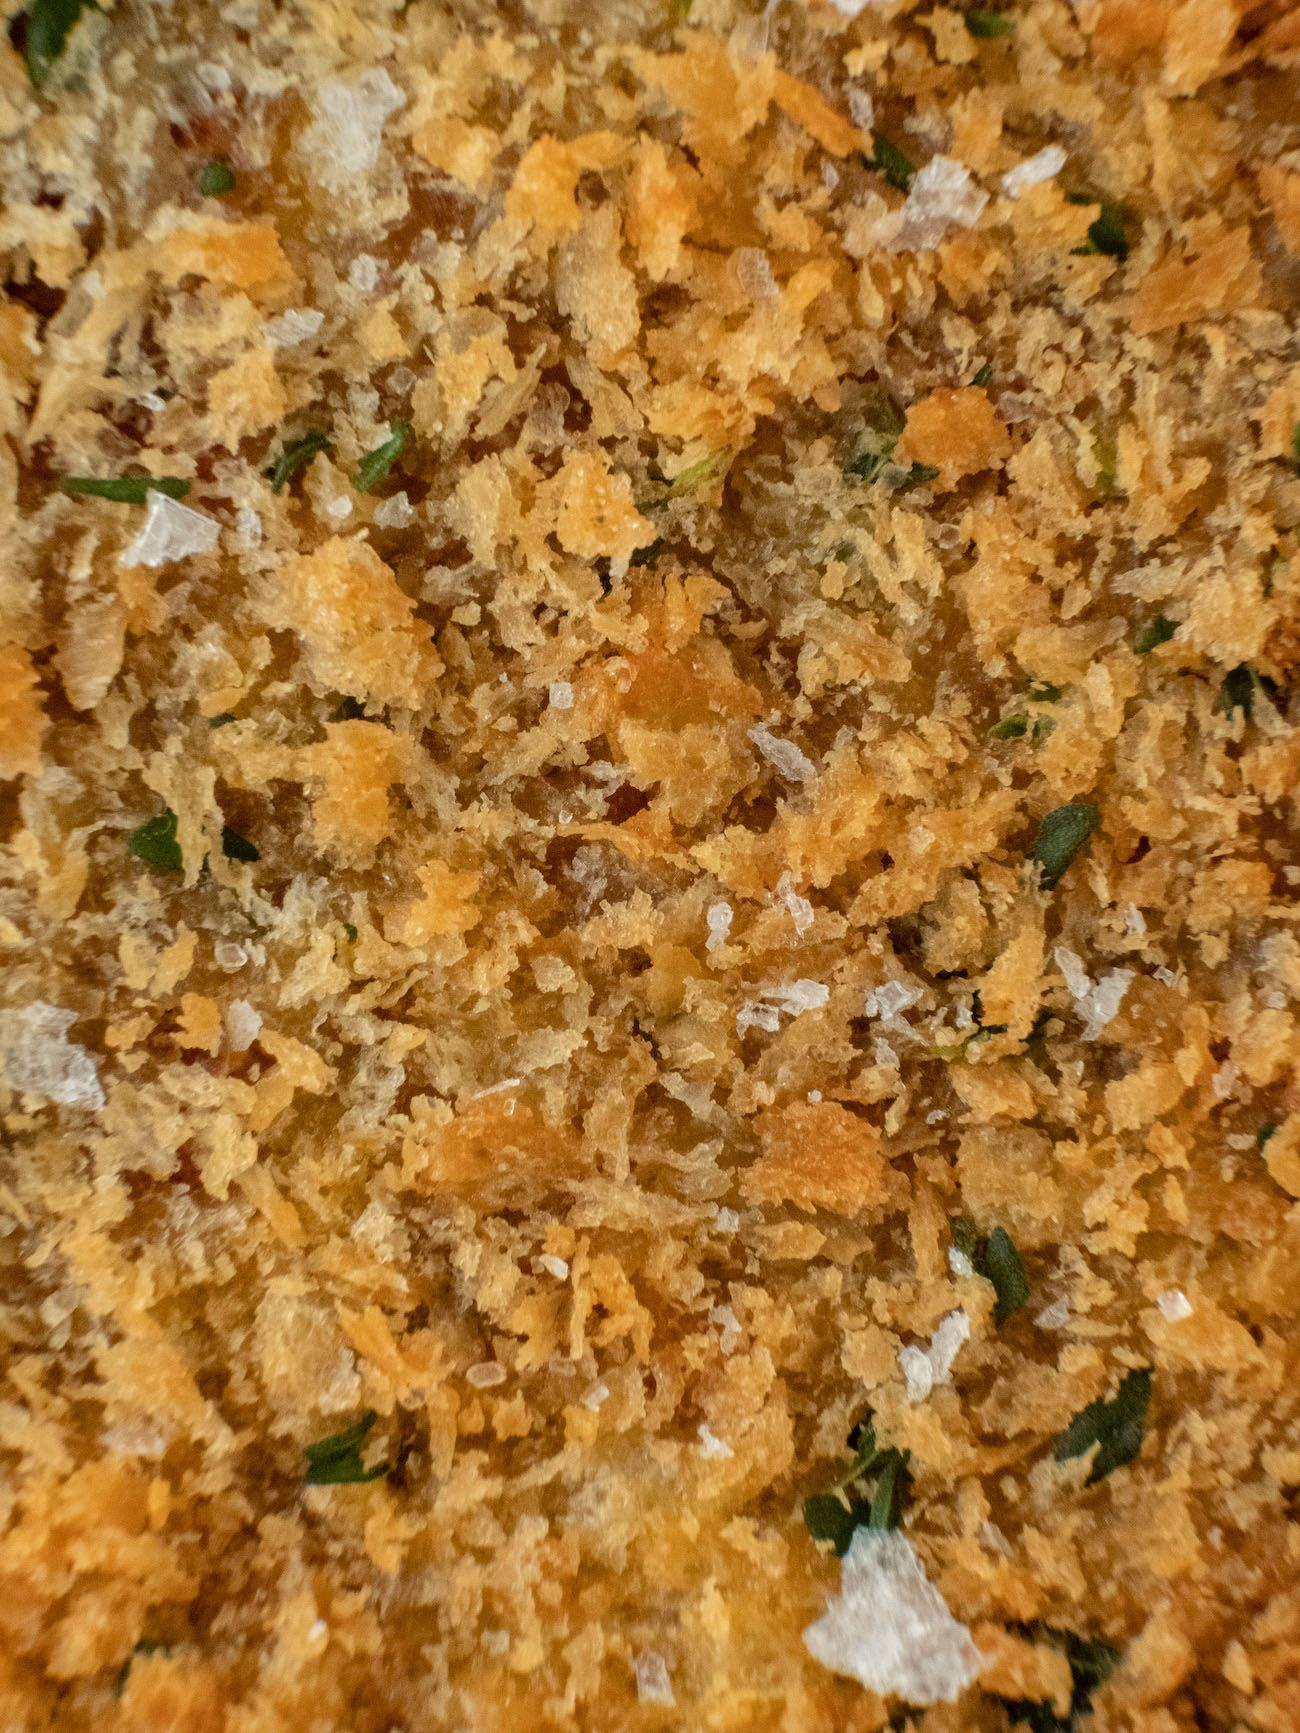 About Fuel, Foodblog, Bold Foods, Rezept, The Big T Schnitzel mit Reis und Avocadocreme, Panko, Salz